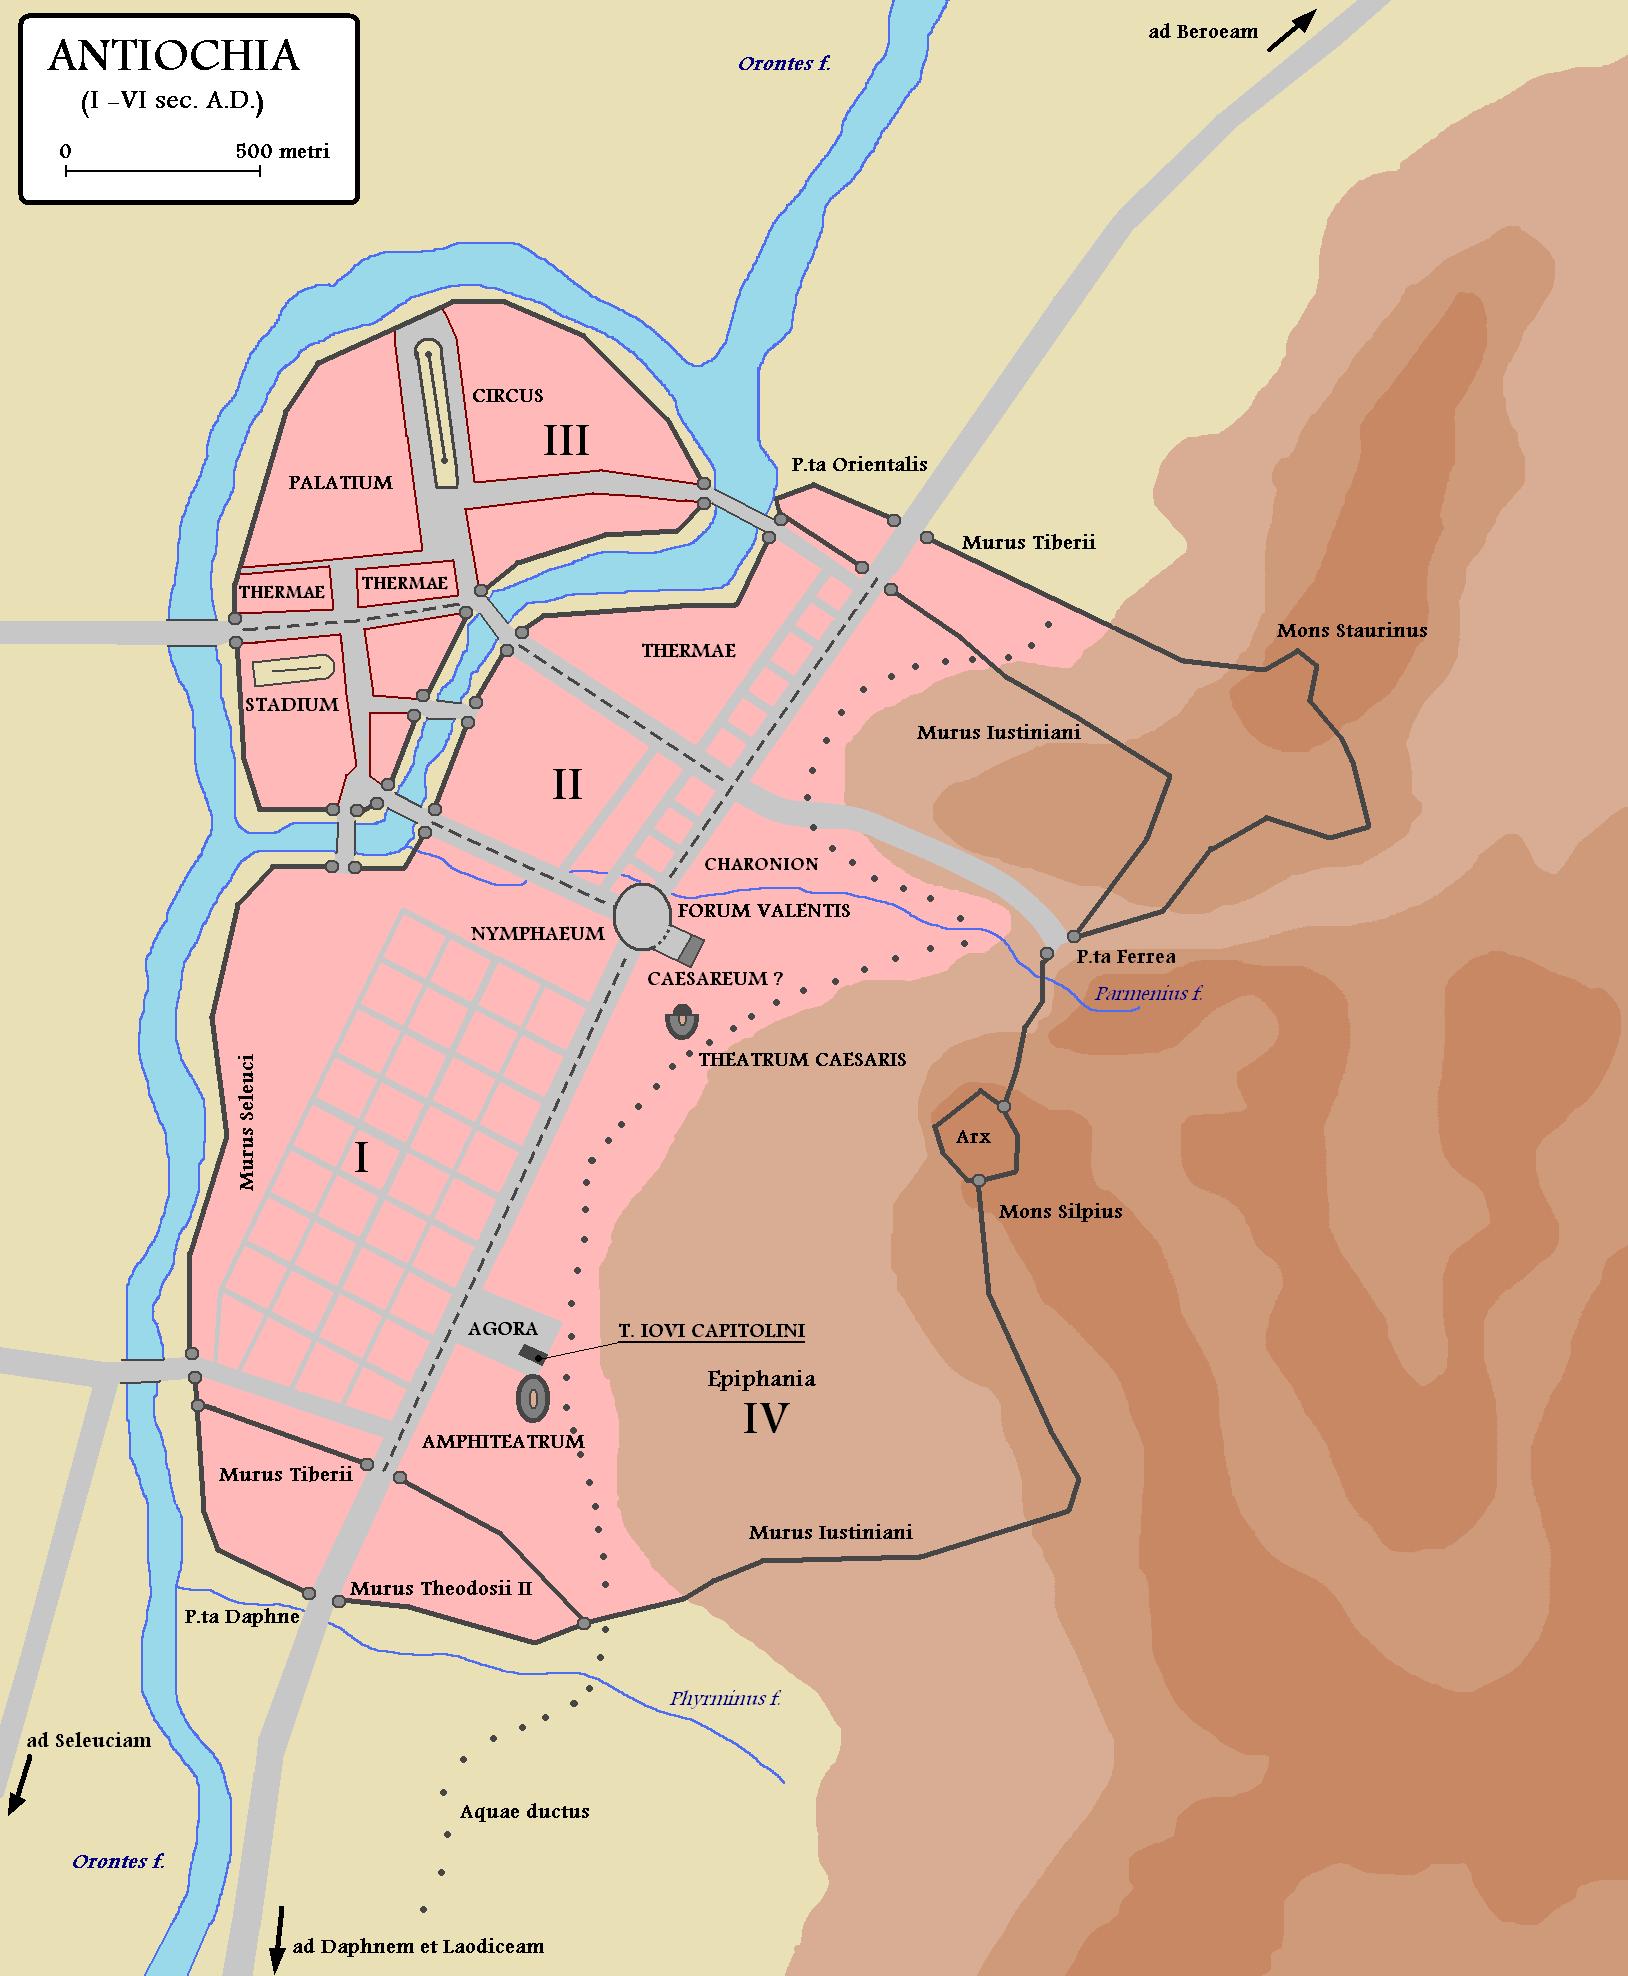 Antioch - Wikipedia